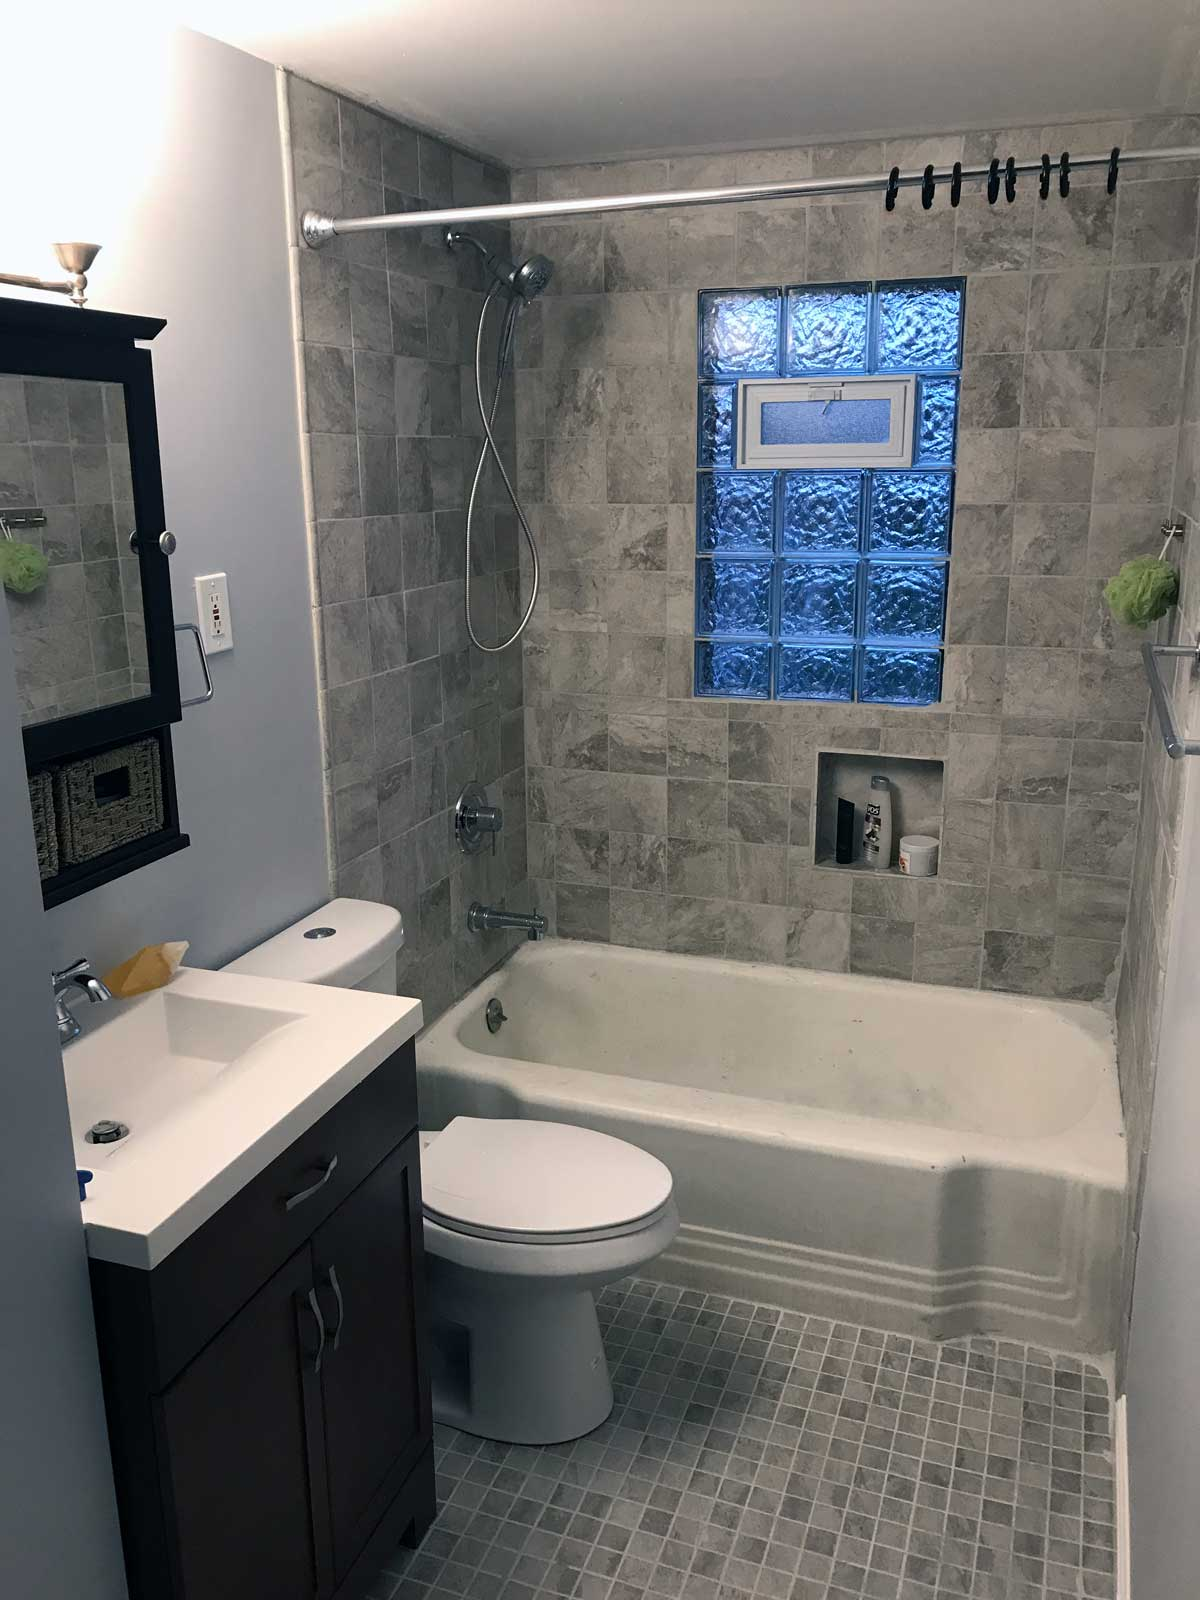 15 Day Bathroom Renovation After